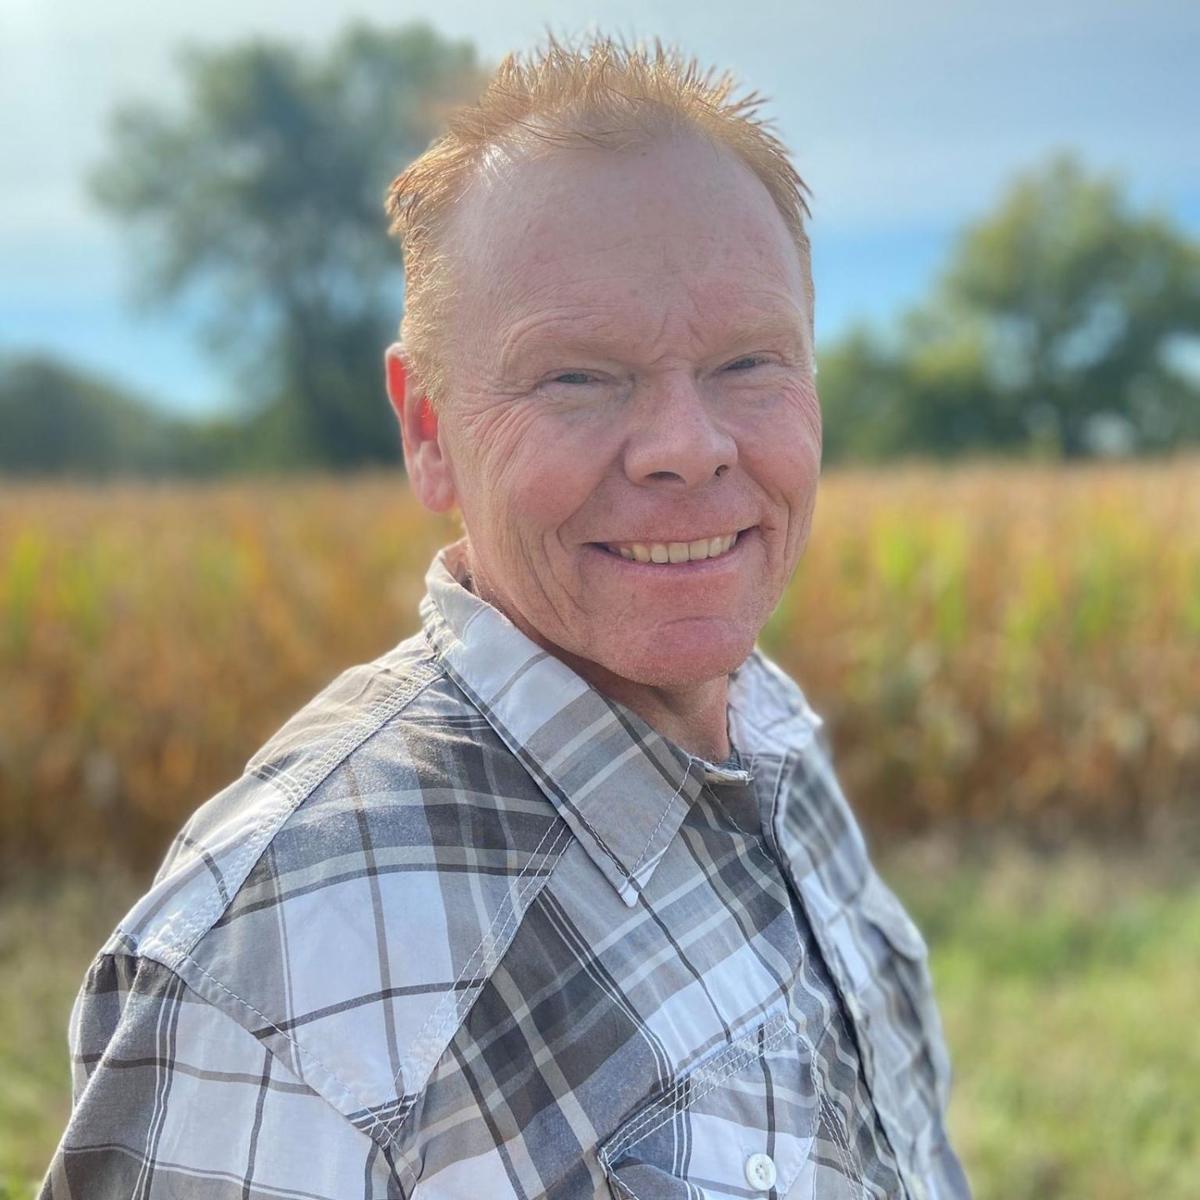 Troy Launsby, dakota county board candidate